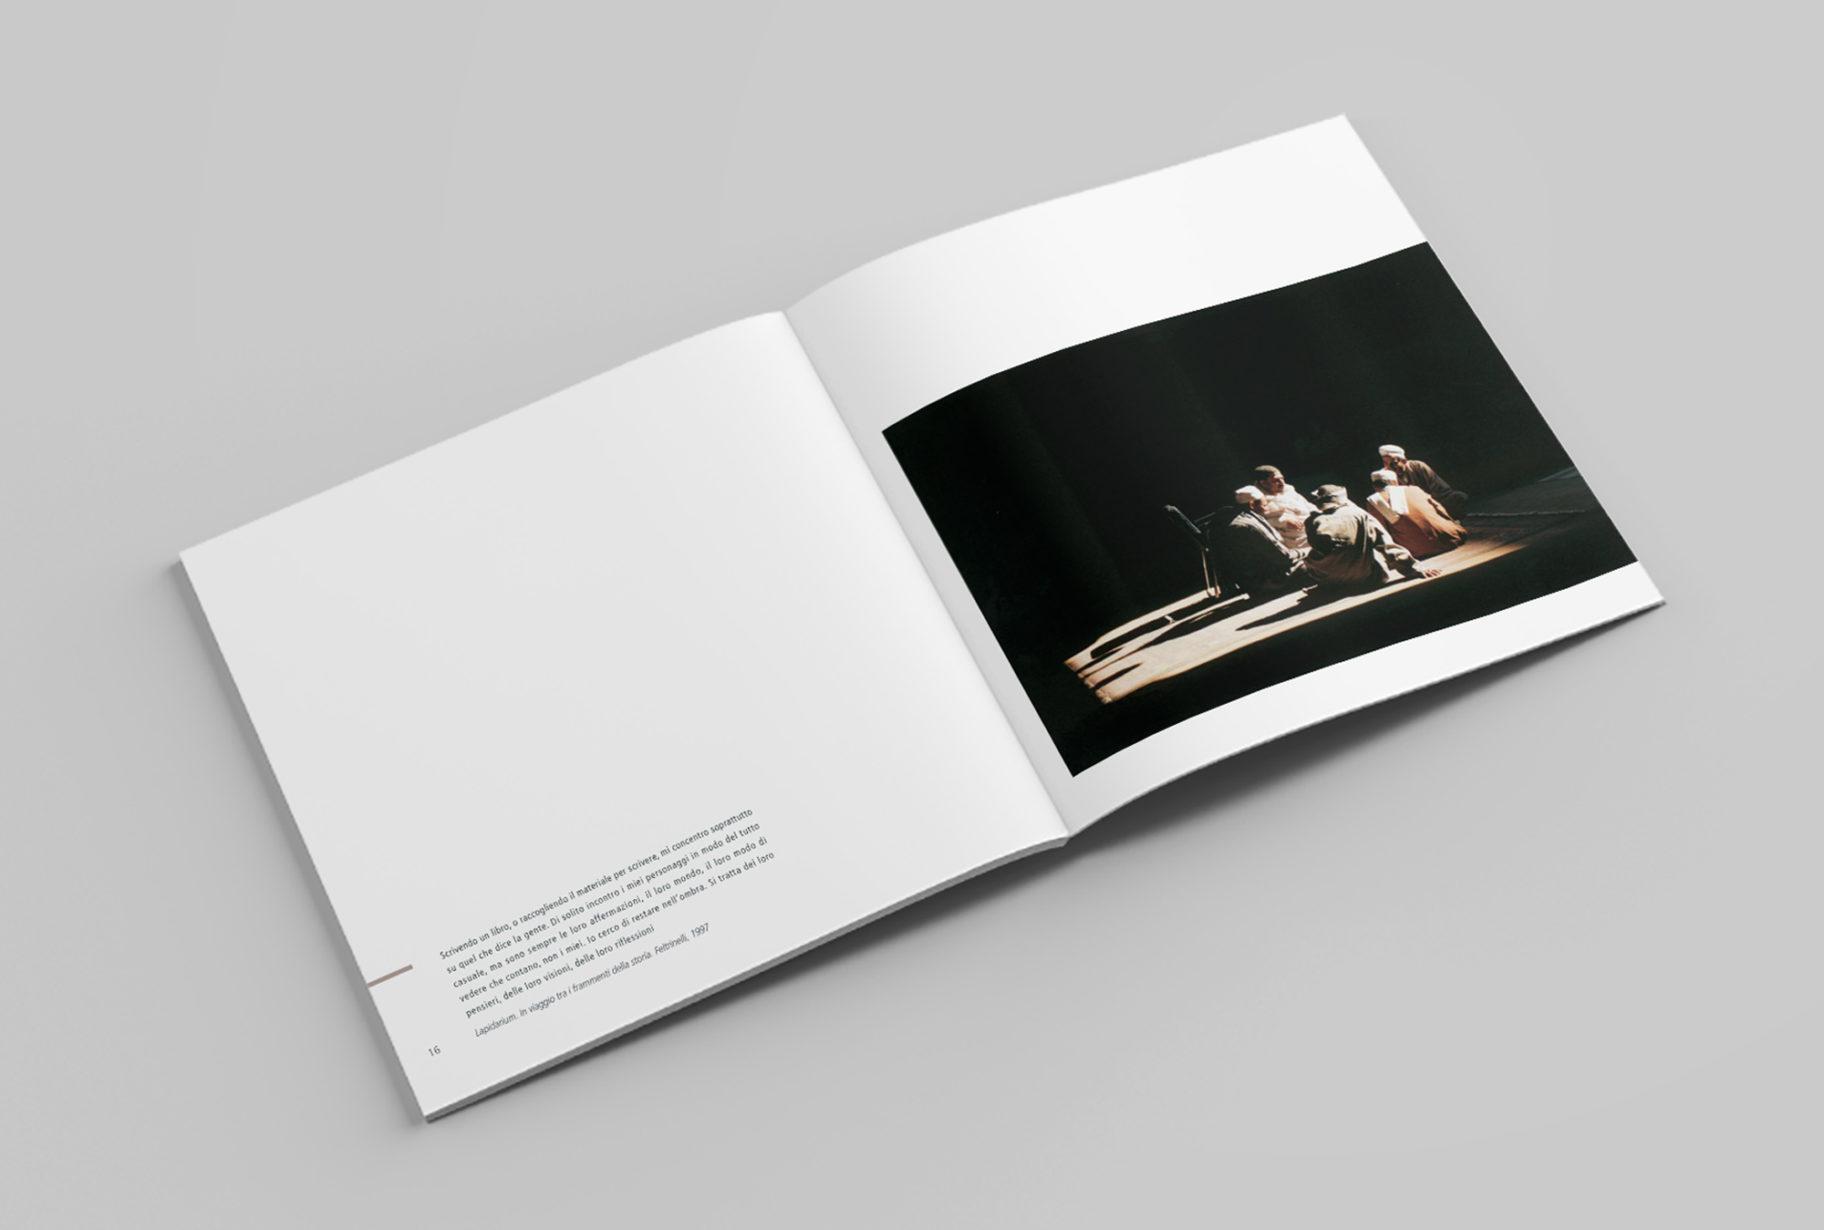 cenobio-kapuscinski-brochure-05